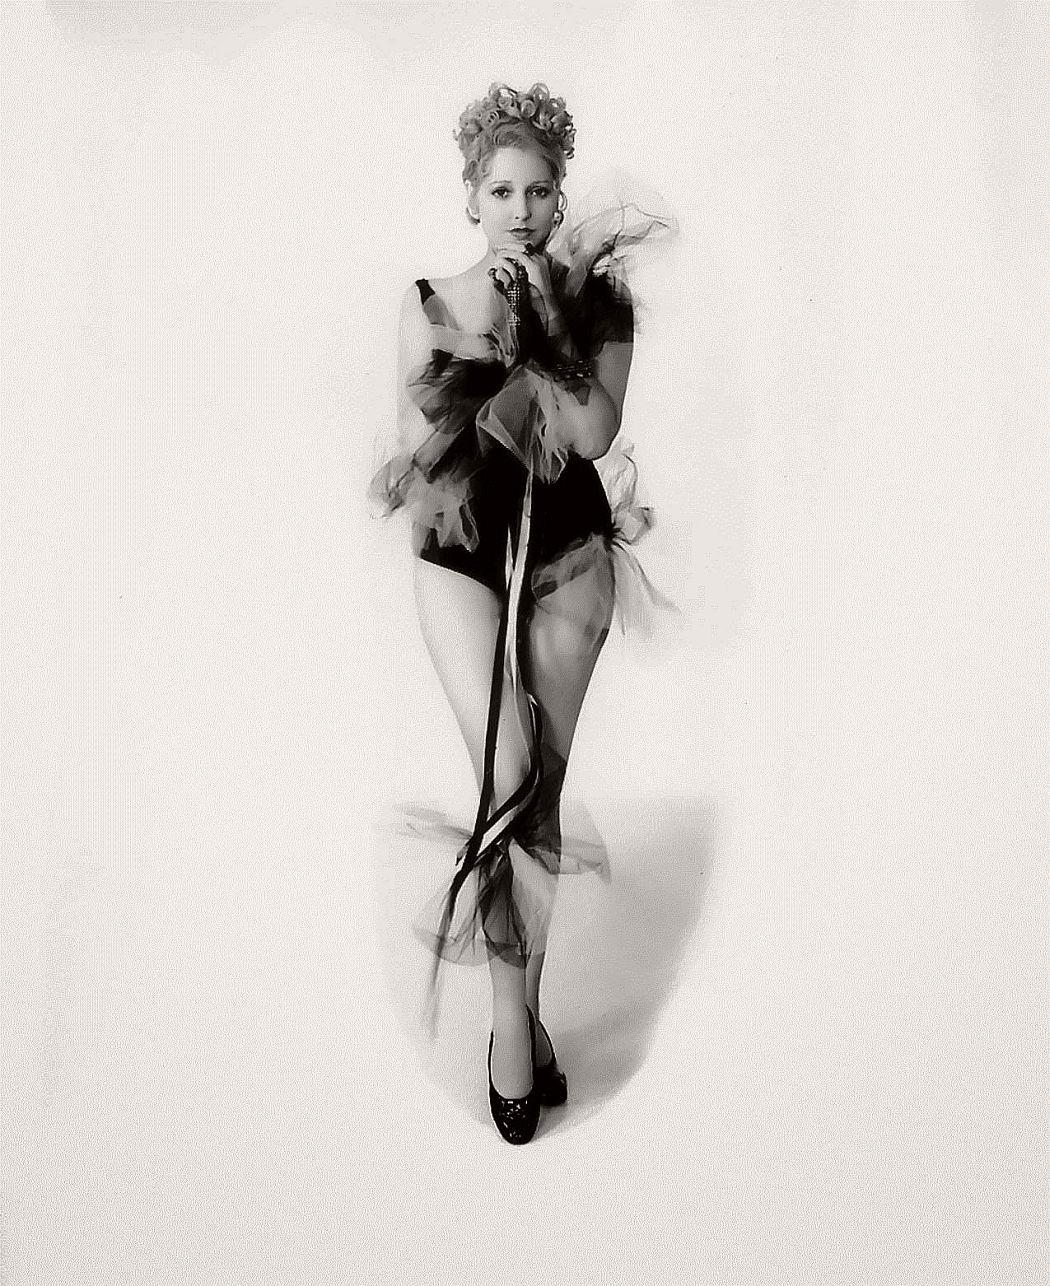 vintage-black-white-portrait-hollywood-movie-actress-1930s-Thelma-Todd